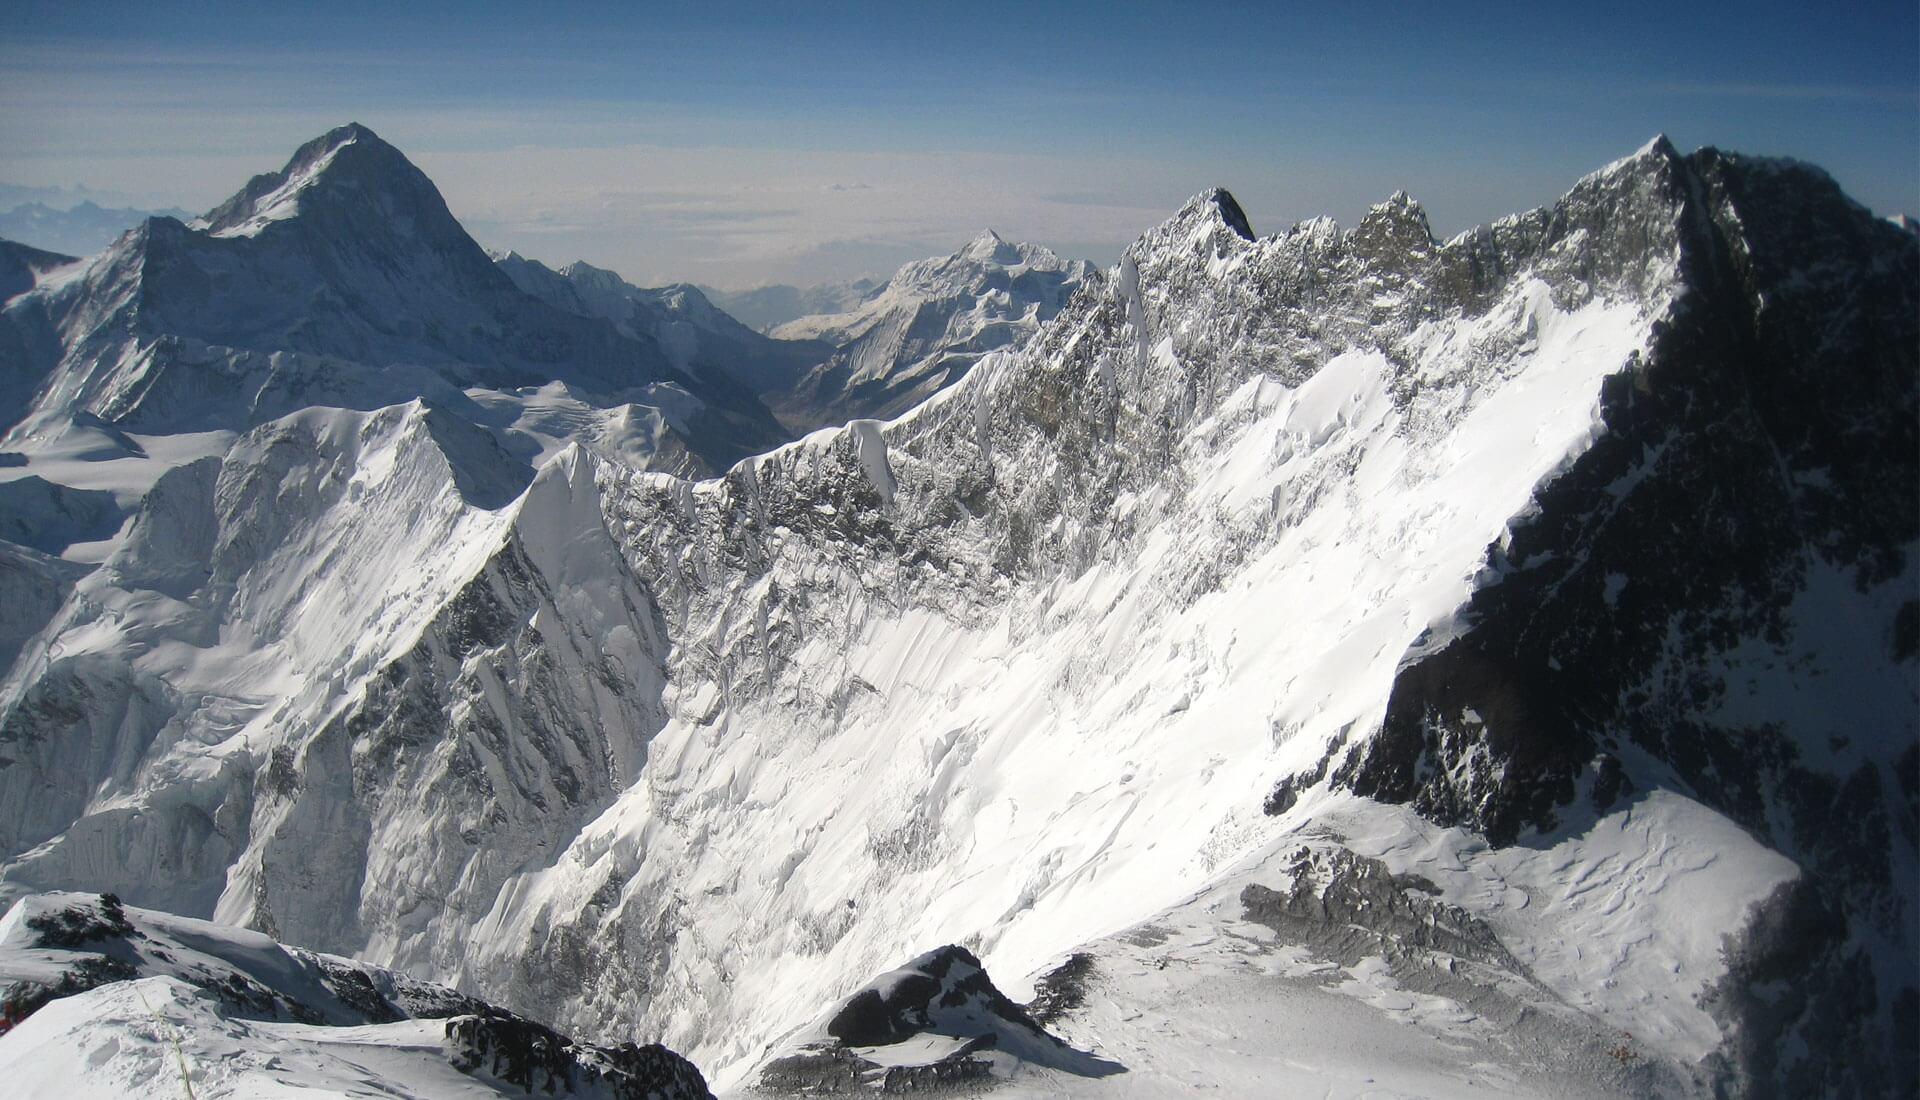 Triple Peaks